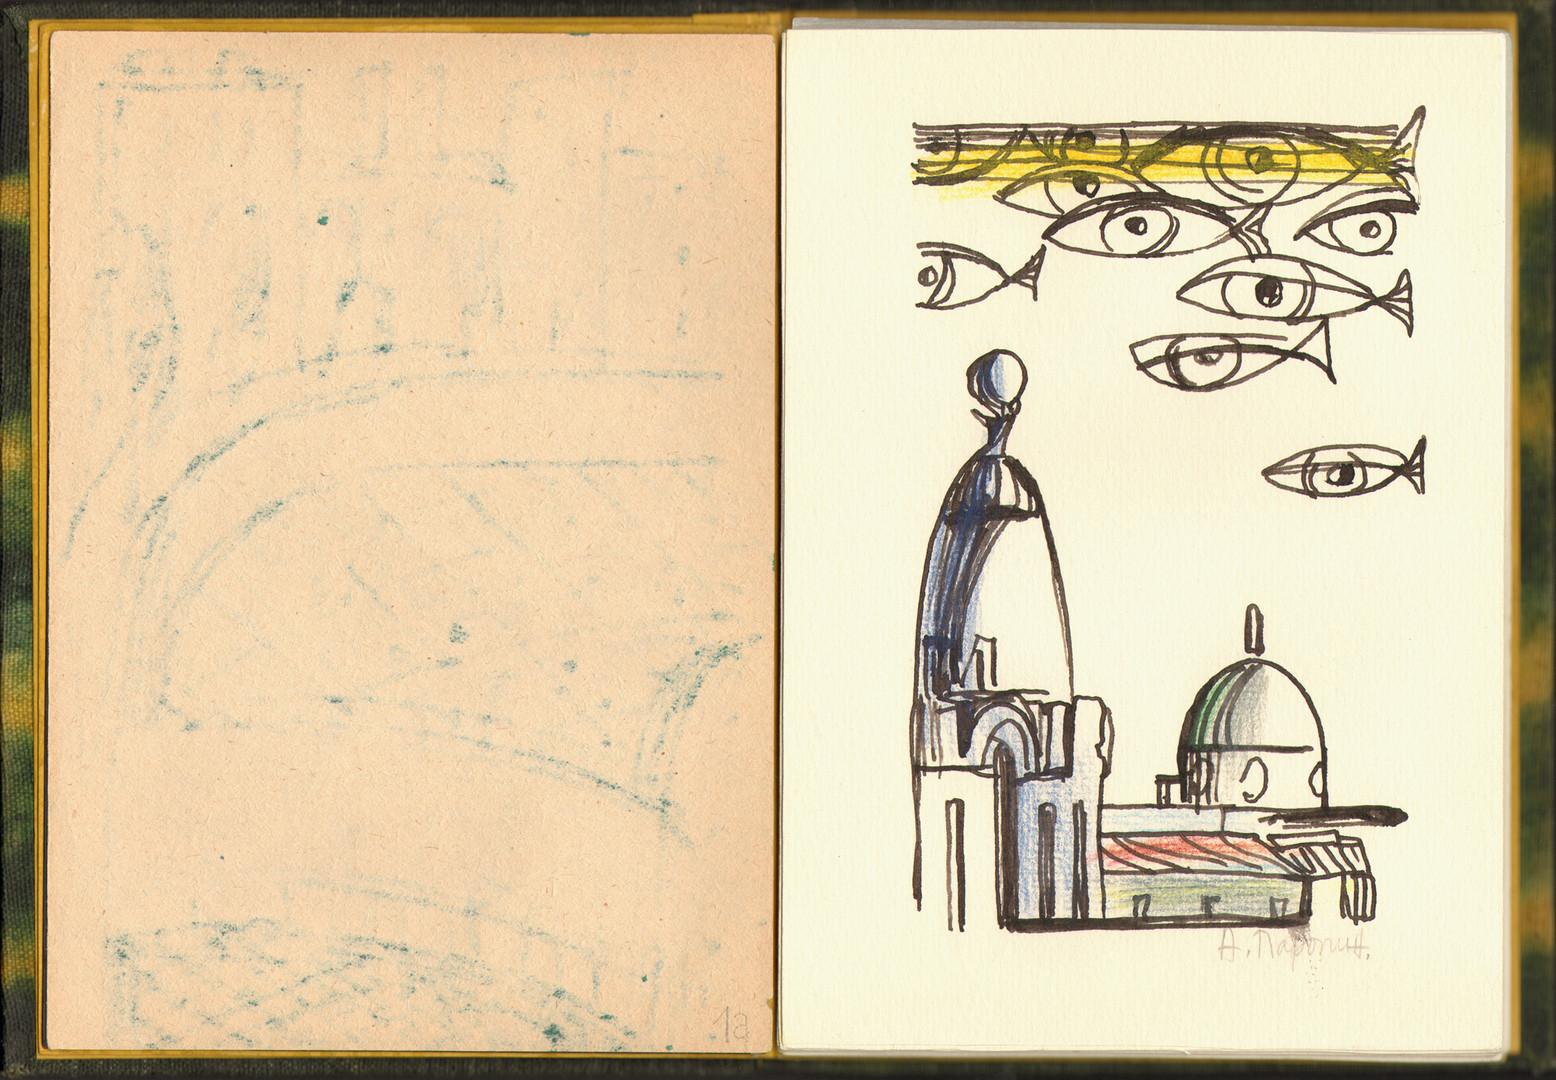 1989 ЗЕЛЕНАЯ КНИГА экз.№3, разварот 4, см. техника, 21,7х31,3 см.